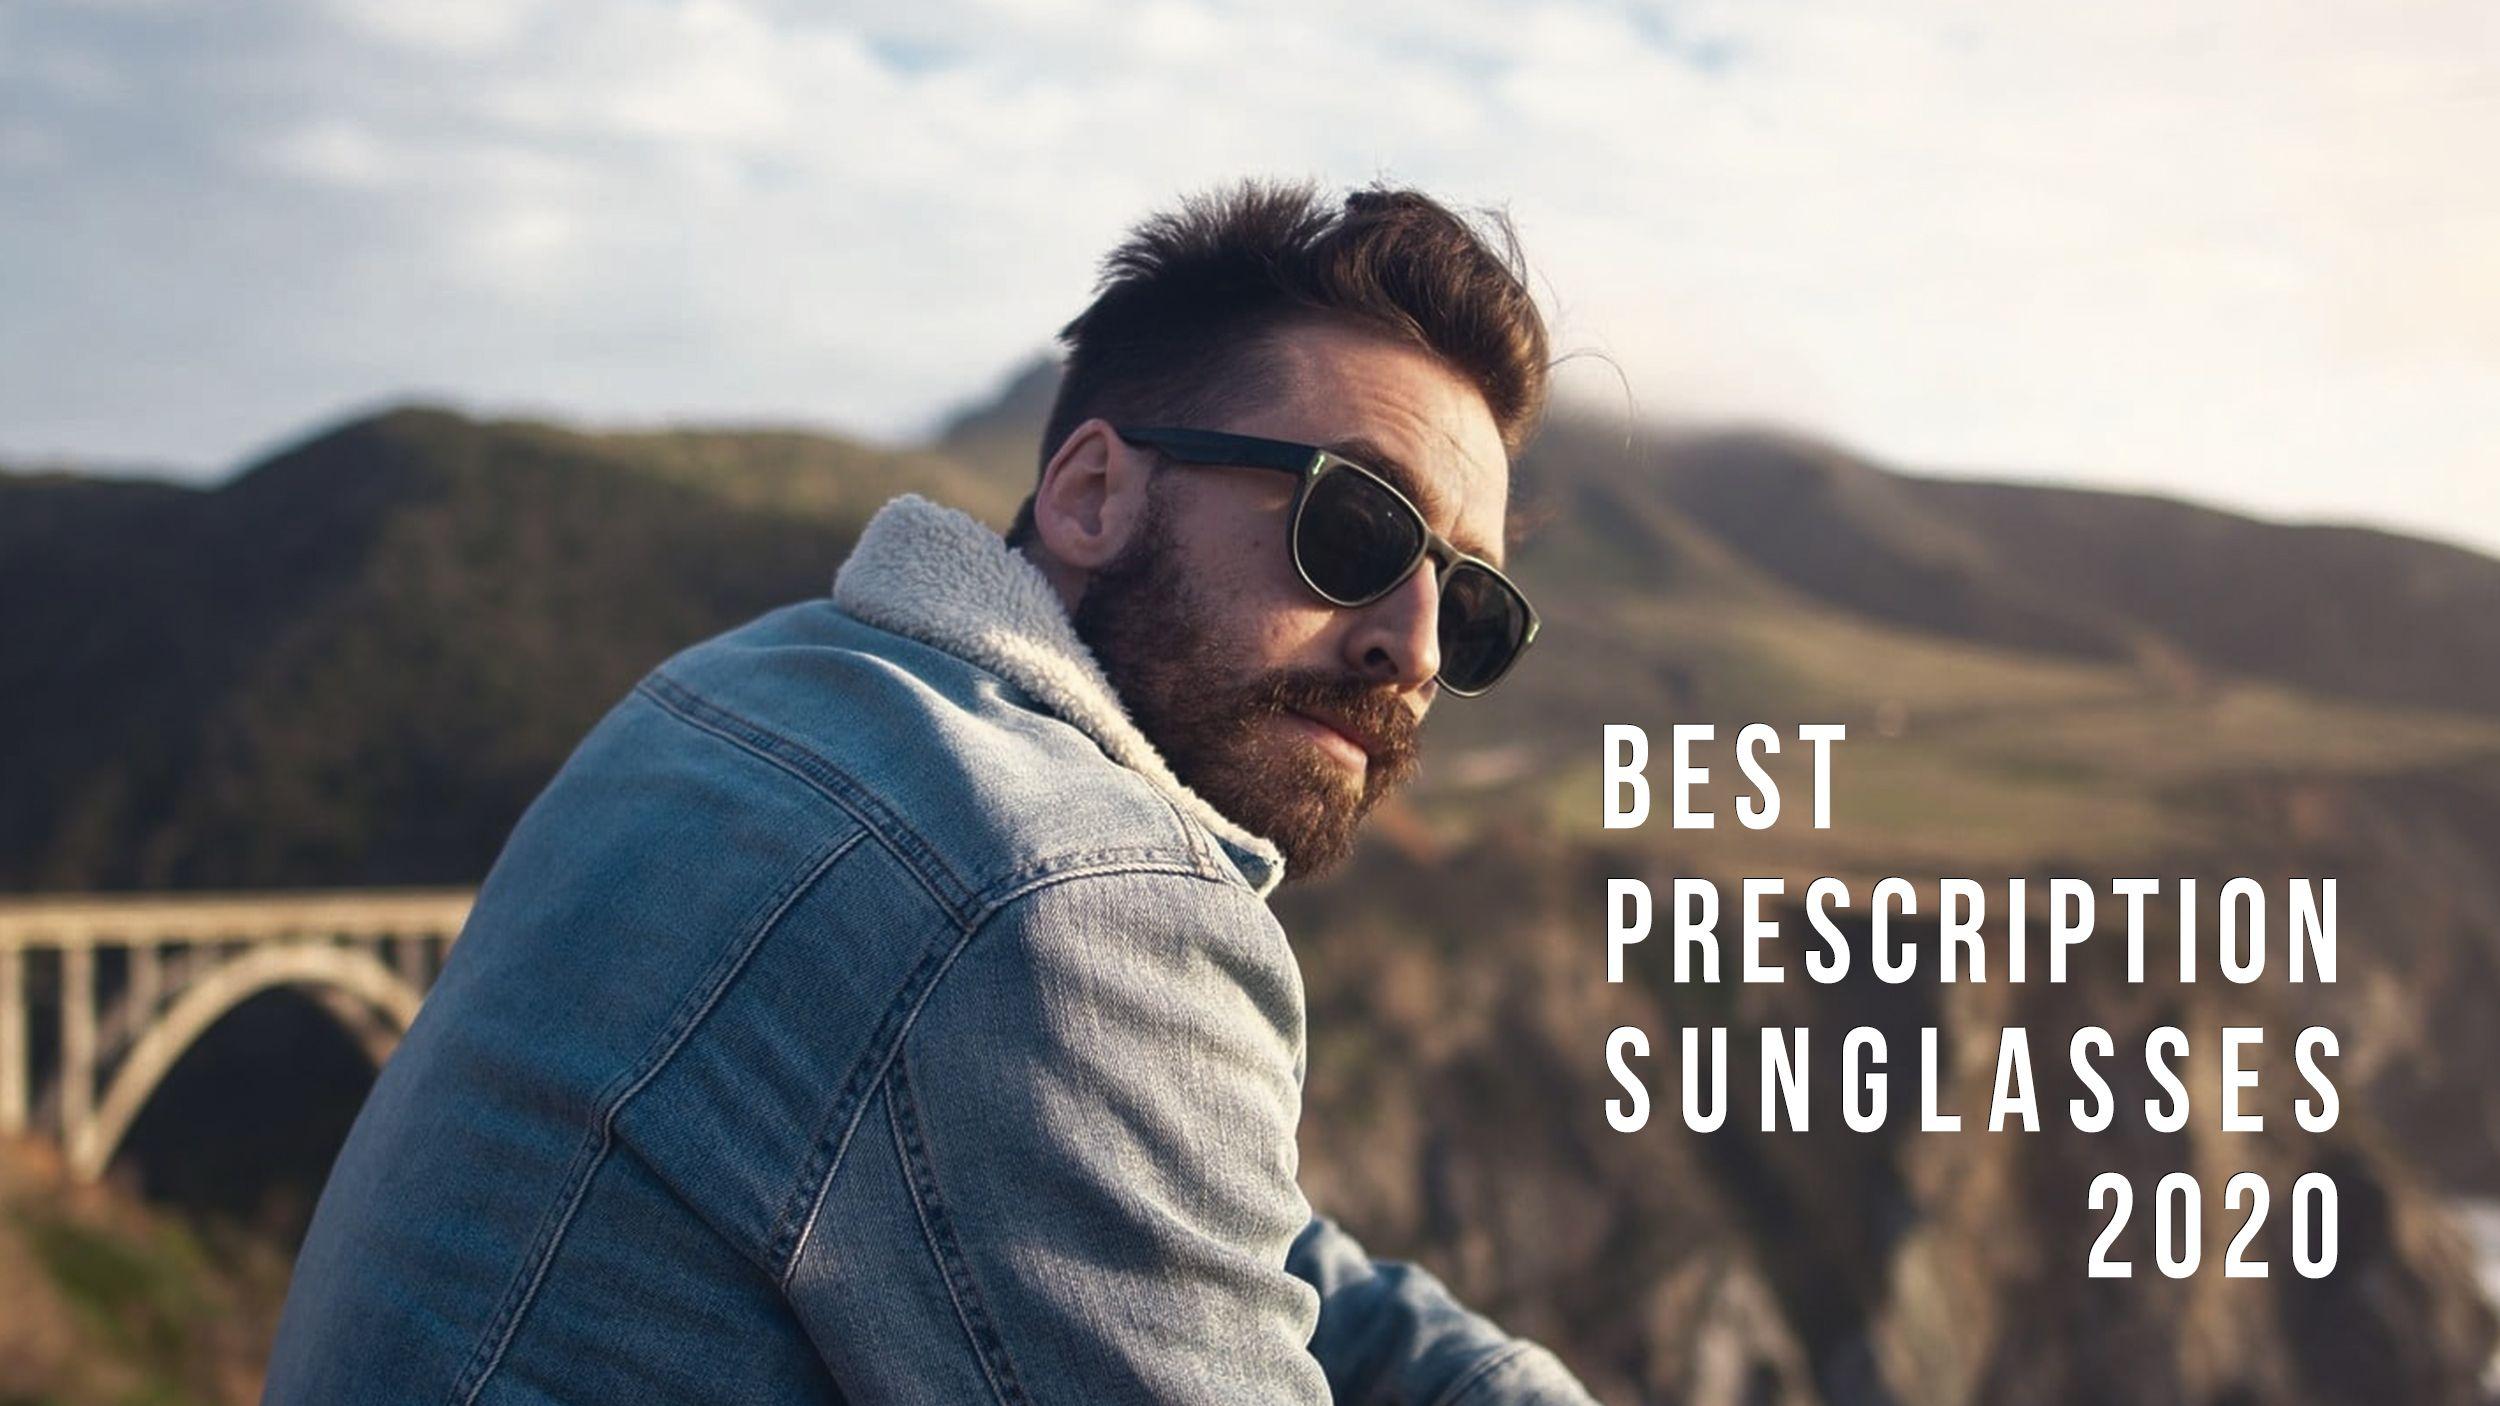 Best Prescription Sunglasses of 2020 Header